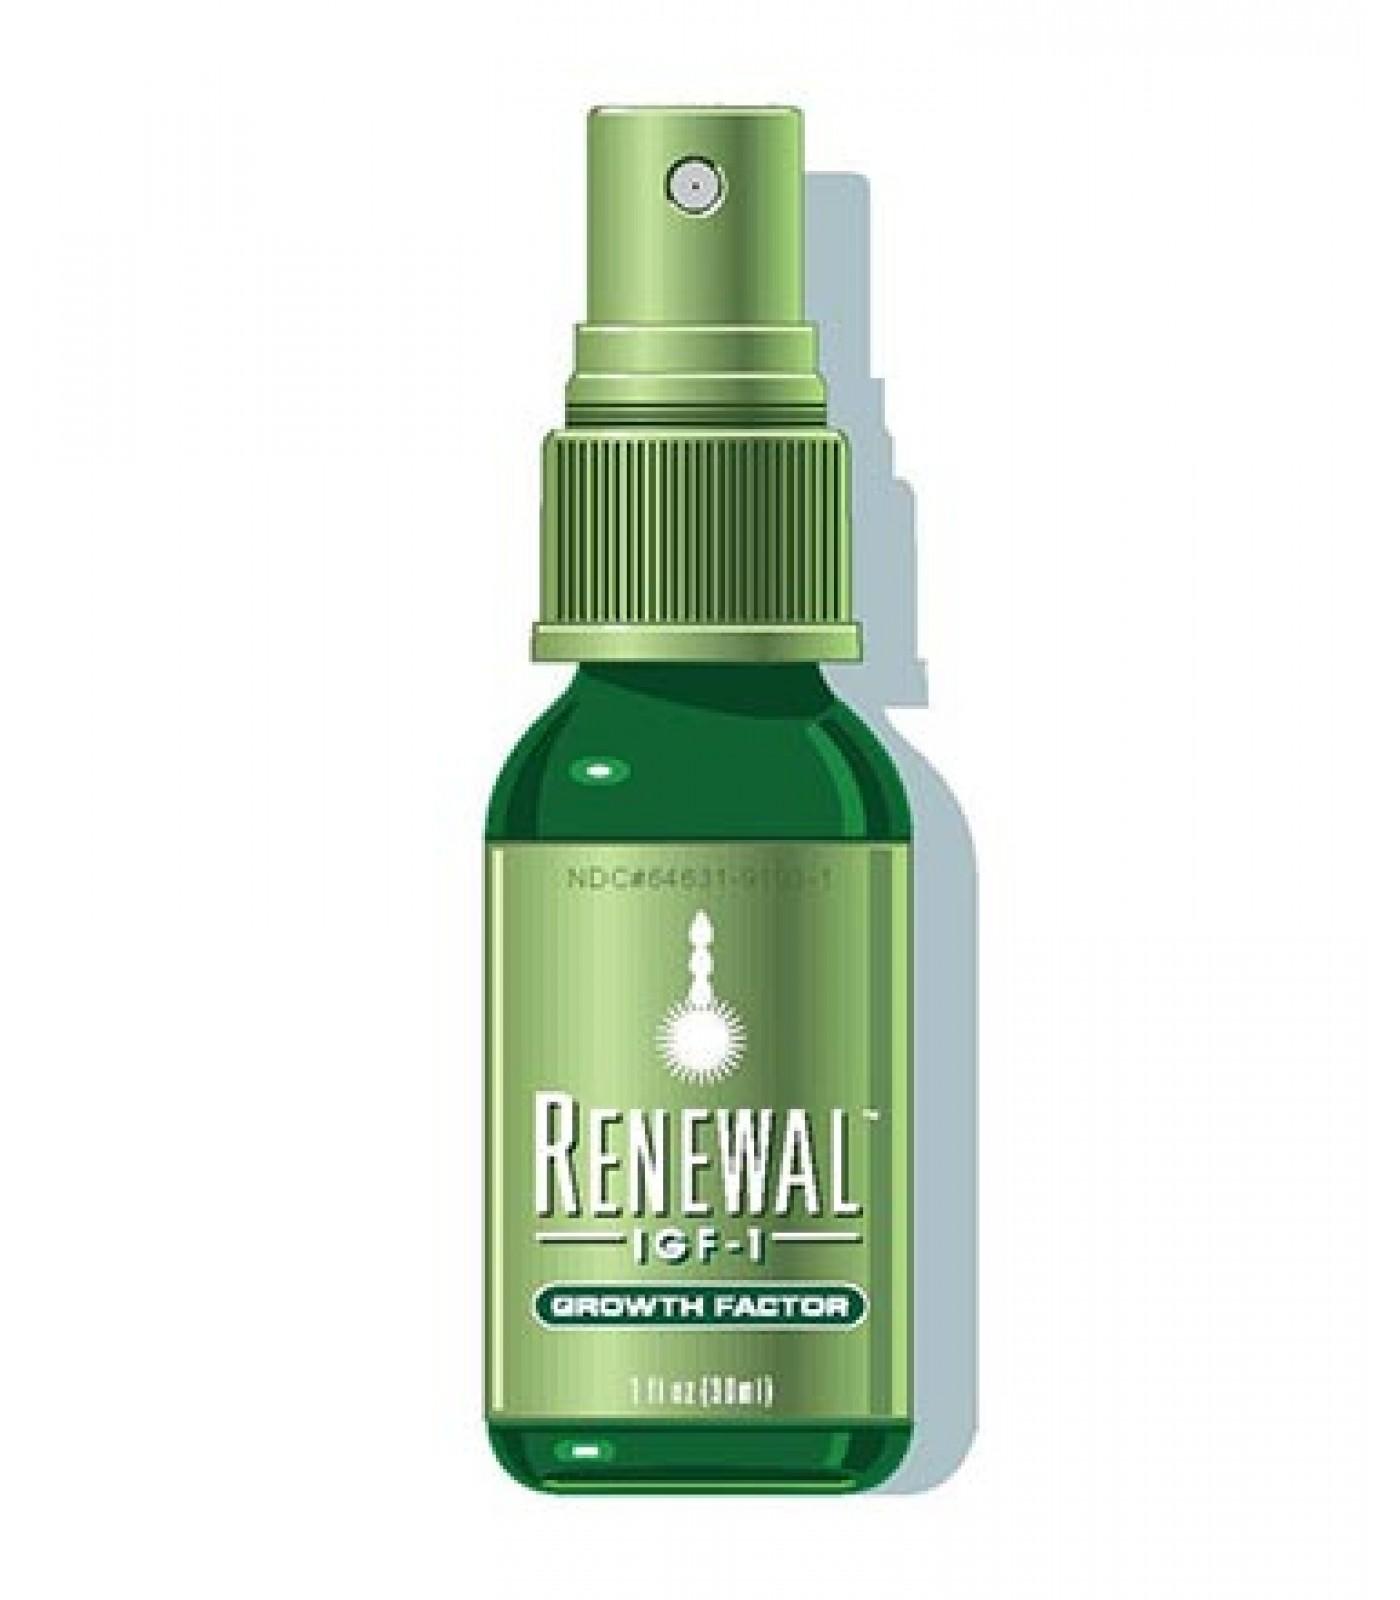 Always Young - Renewal IGF-1 / 180 sprays